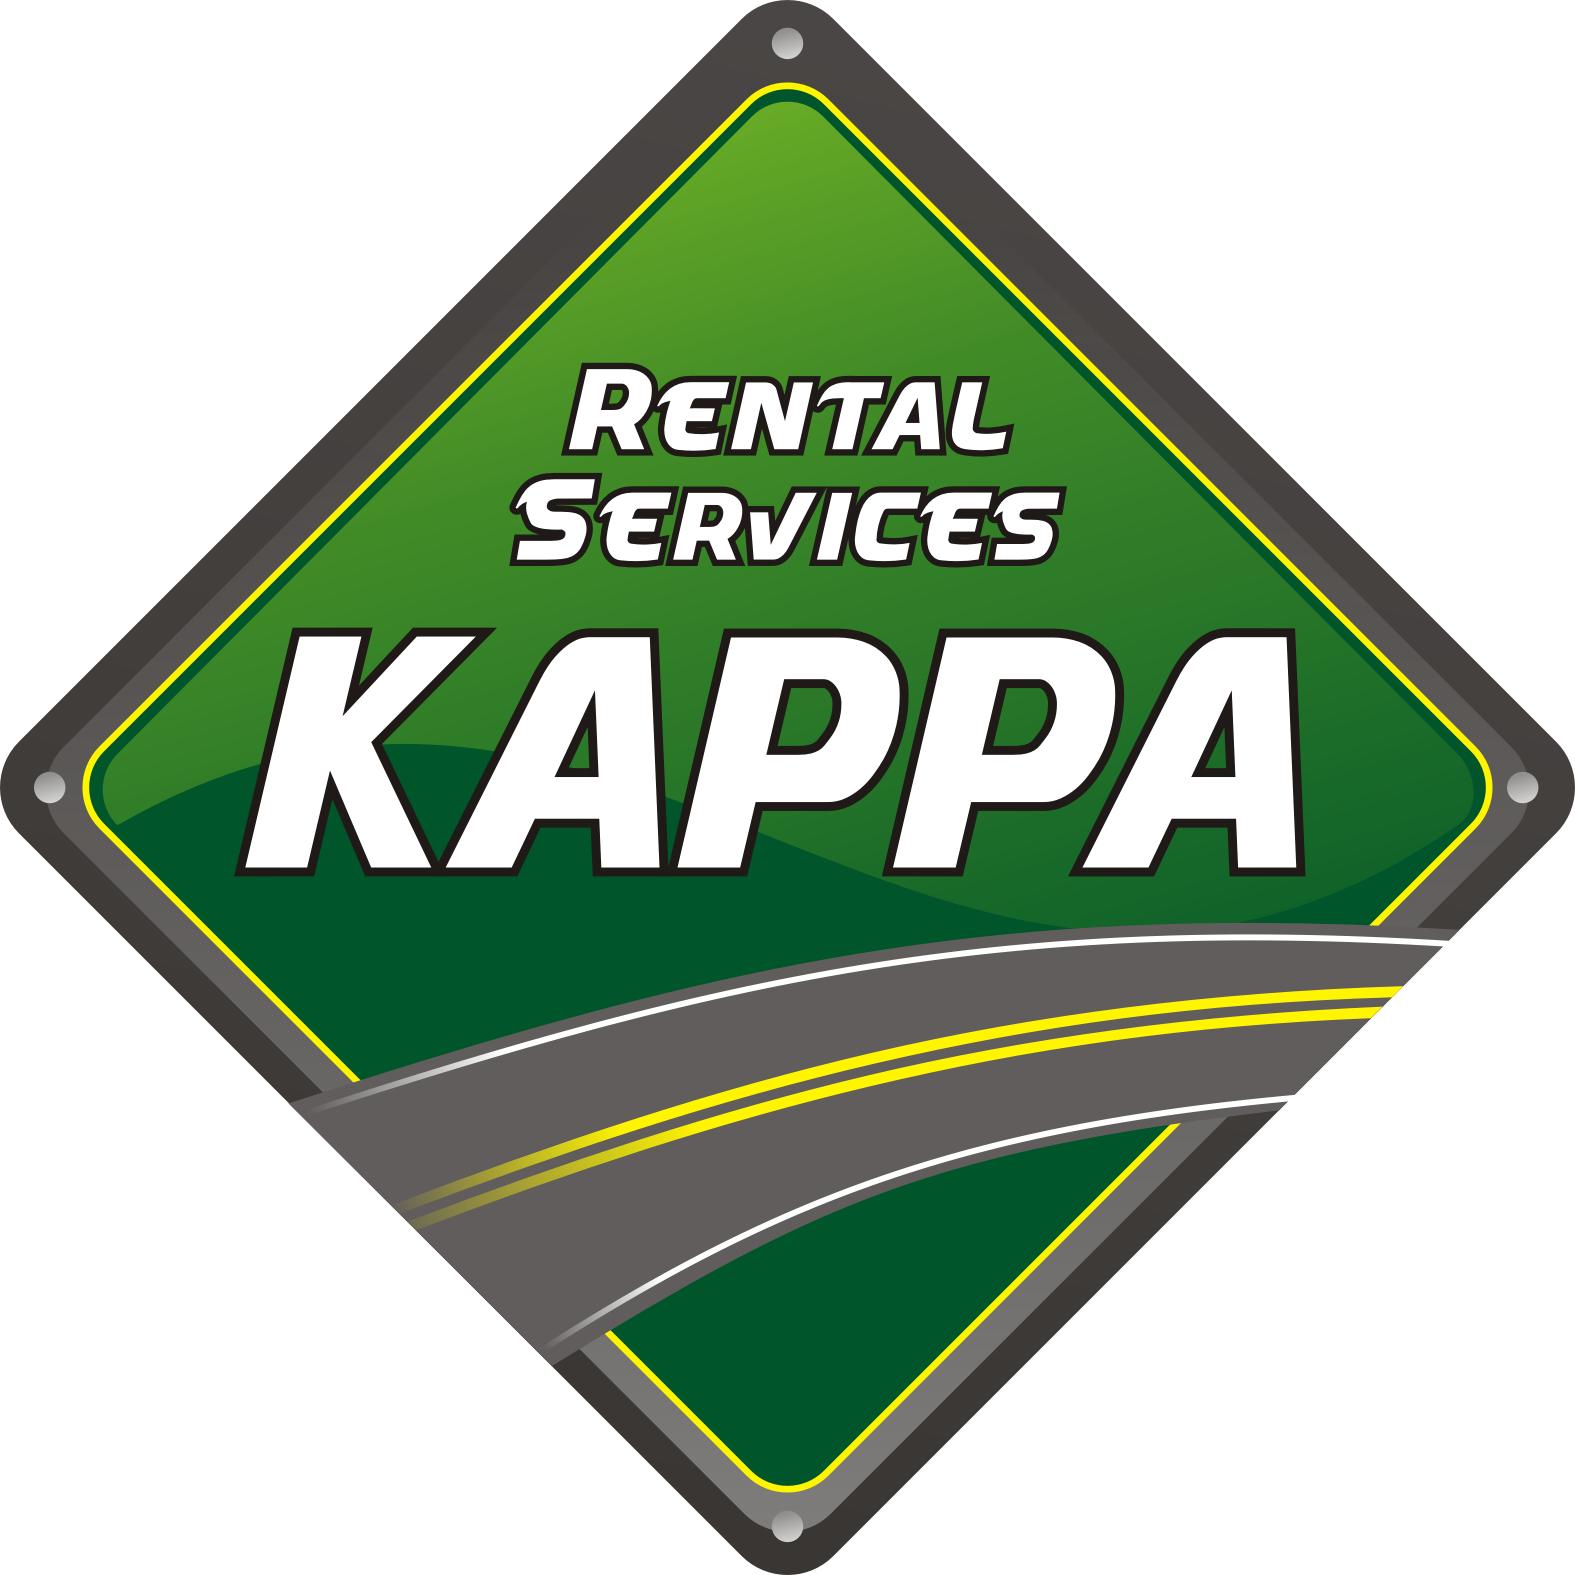 Rental Agencys: Kappa Rental Services